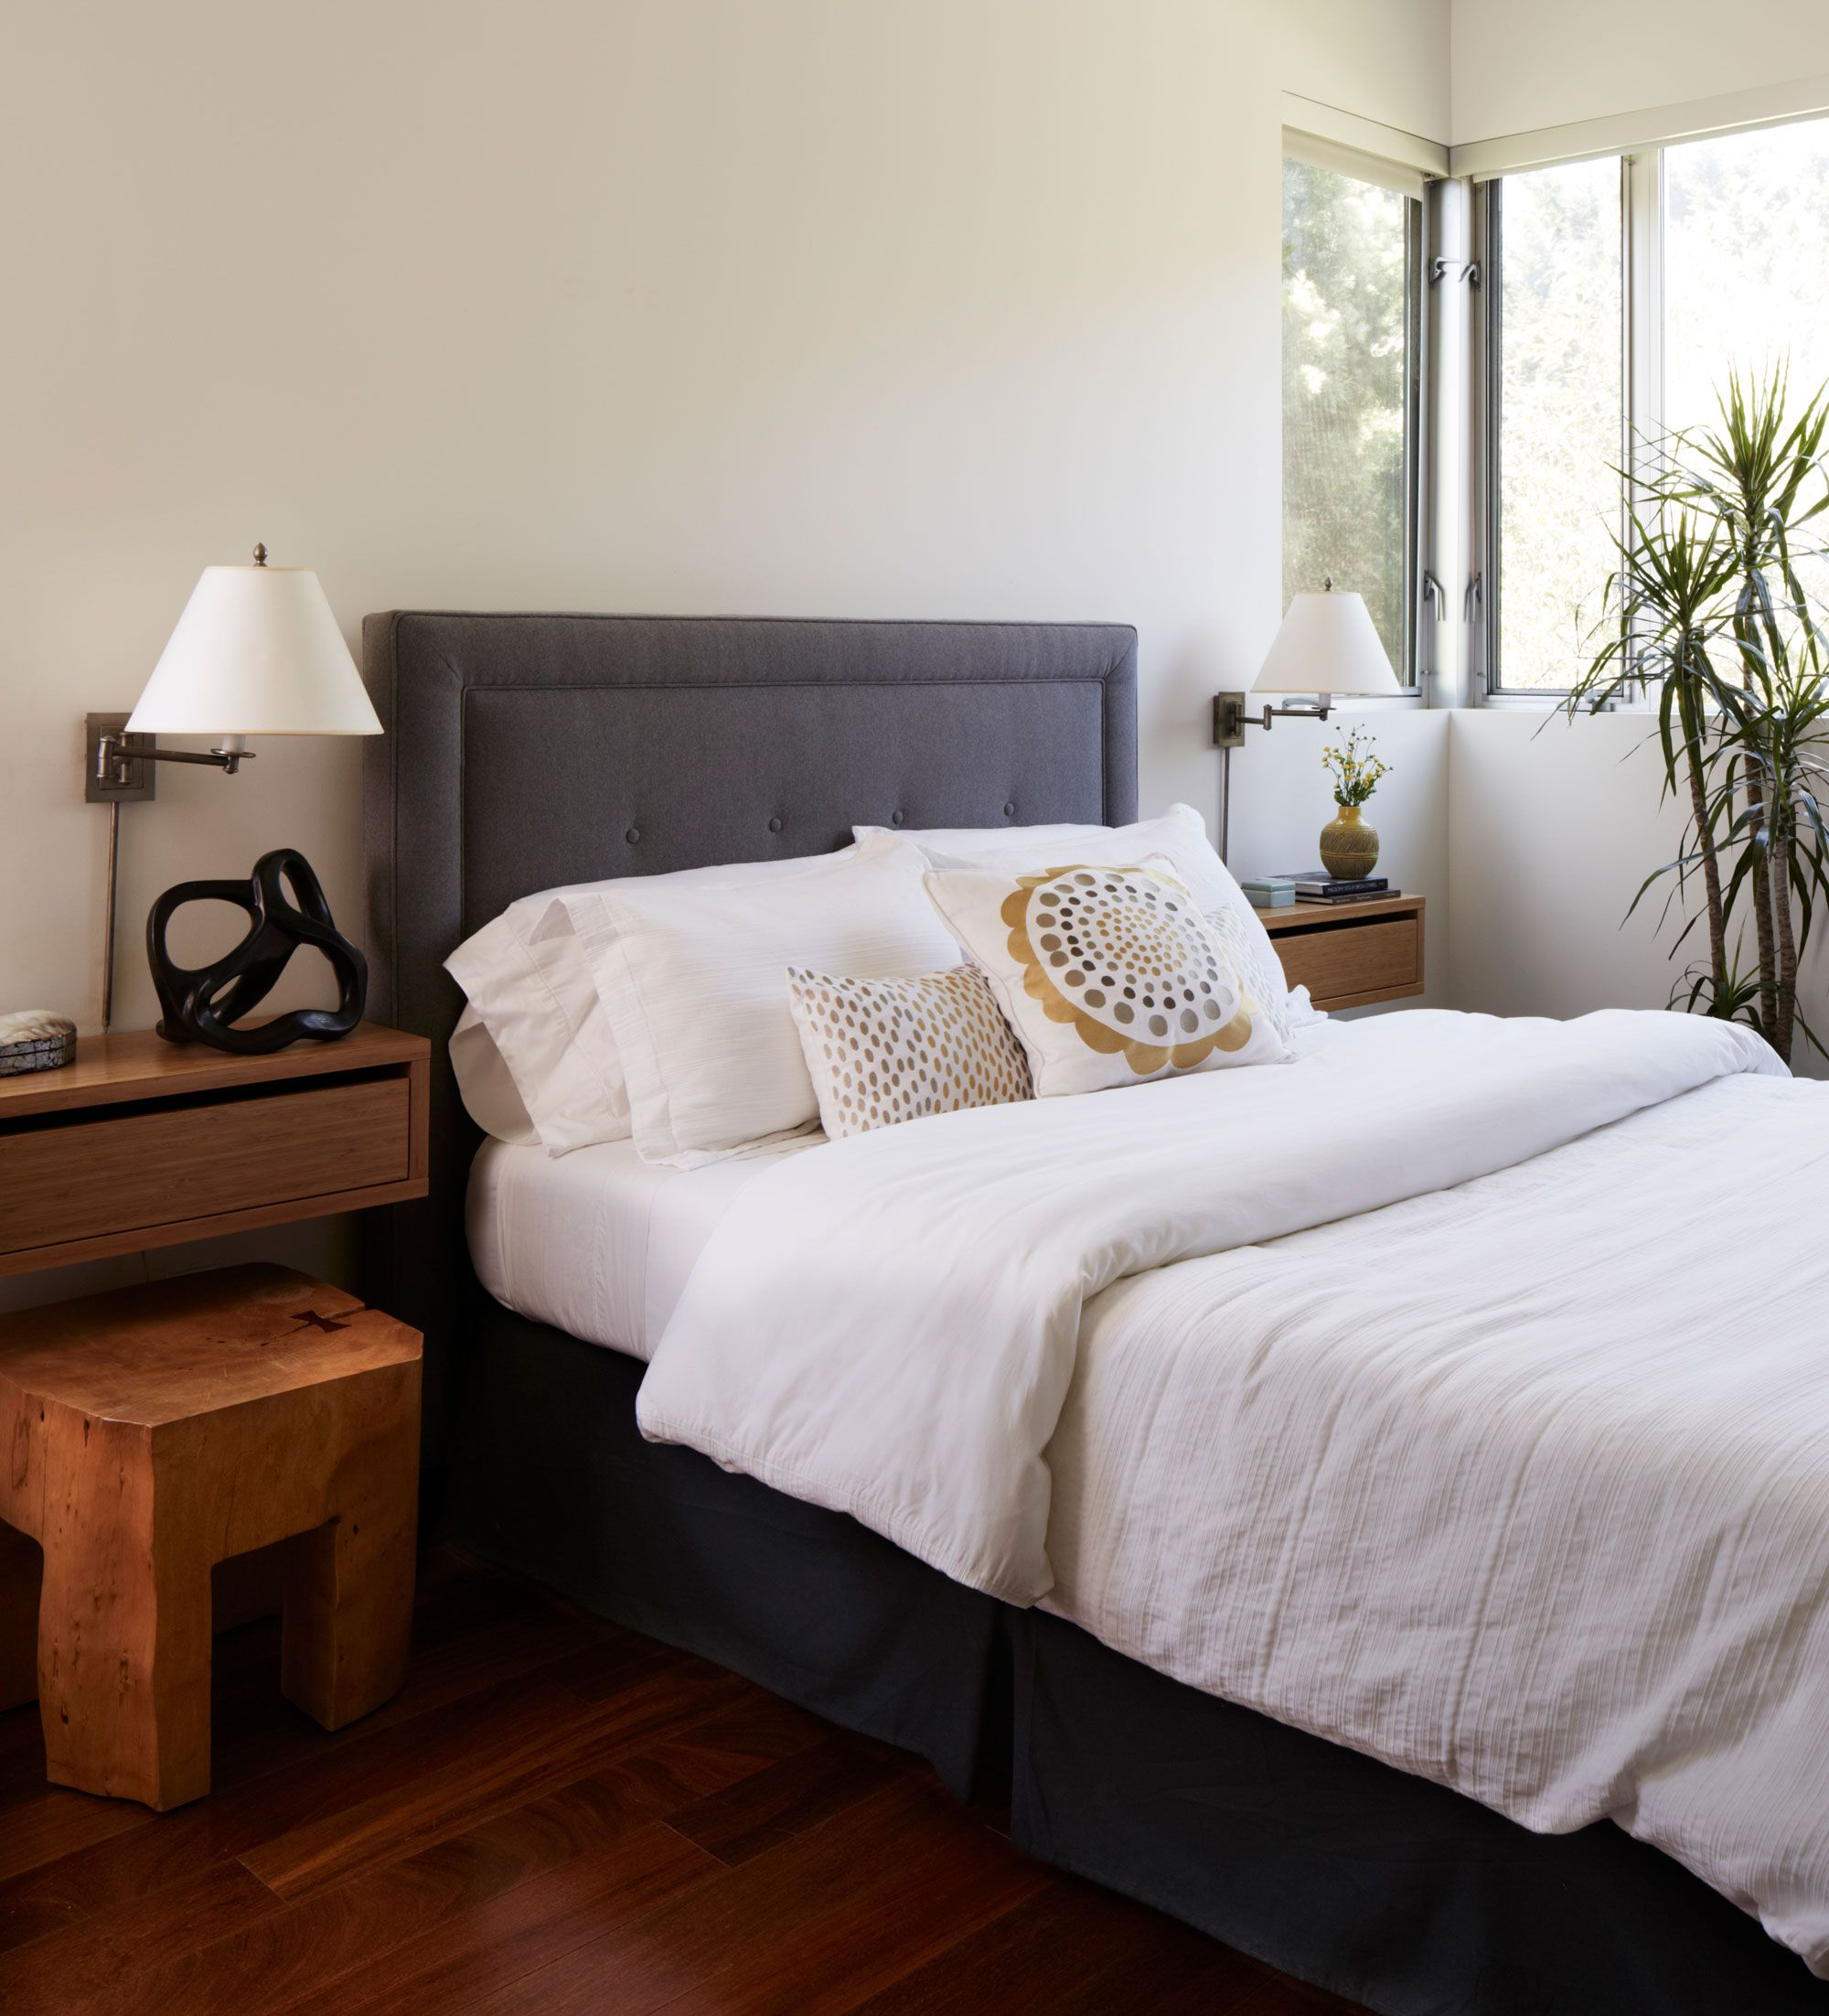 Classic Bedroom Paint Colors Bedroom Ideas Colors Bedroom Paint Bedroom Design With Ceiling: Walls: Instant Classic DET672